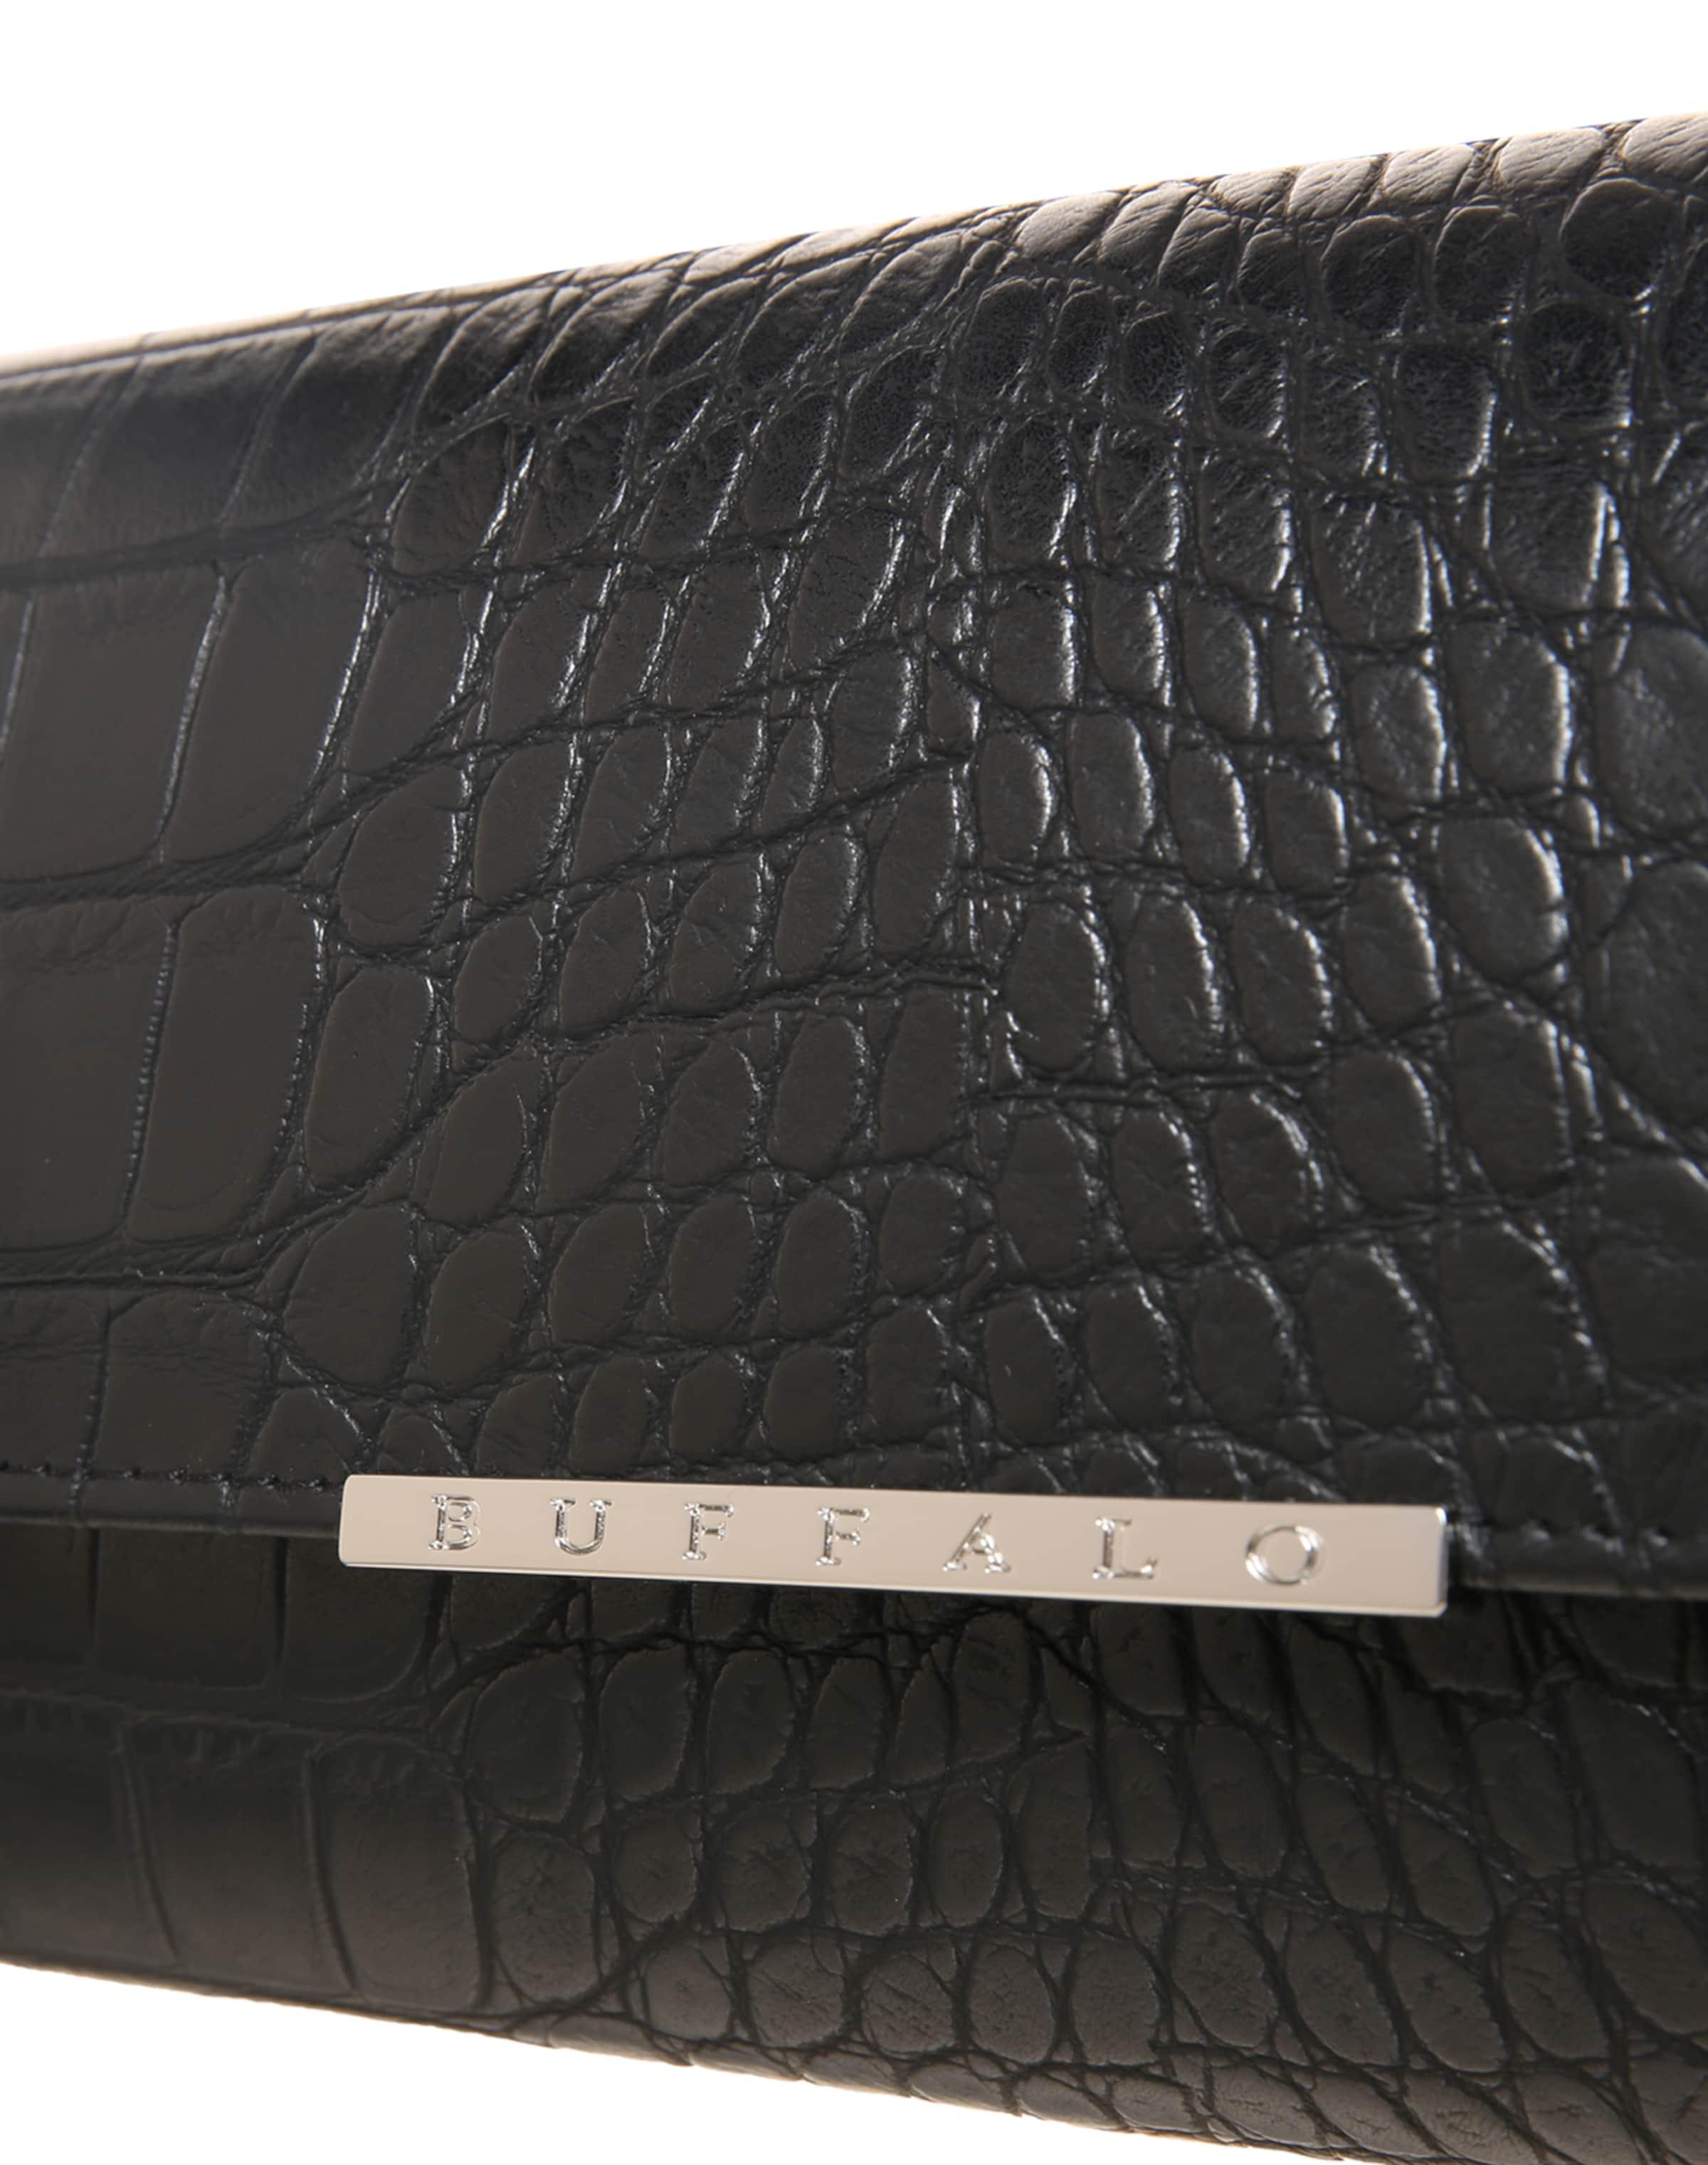 Rabatt Günstig Online Auslasszwischenraum Store BUFFALO Clutch in Lackleder-Optik Rabatt Mit Paypal Aaa Qualität j2mTn